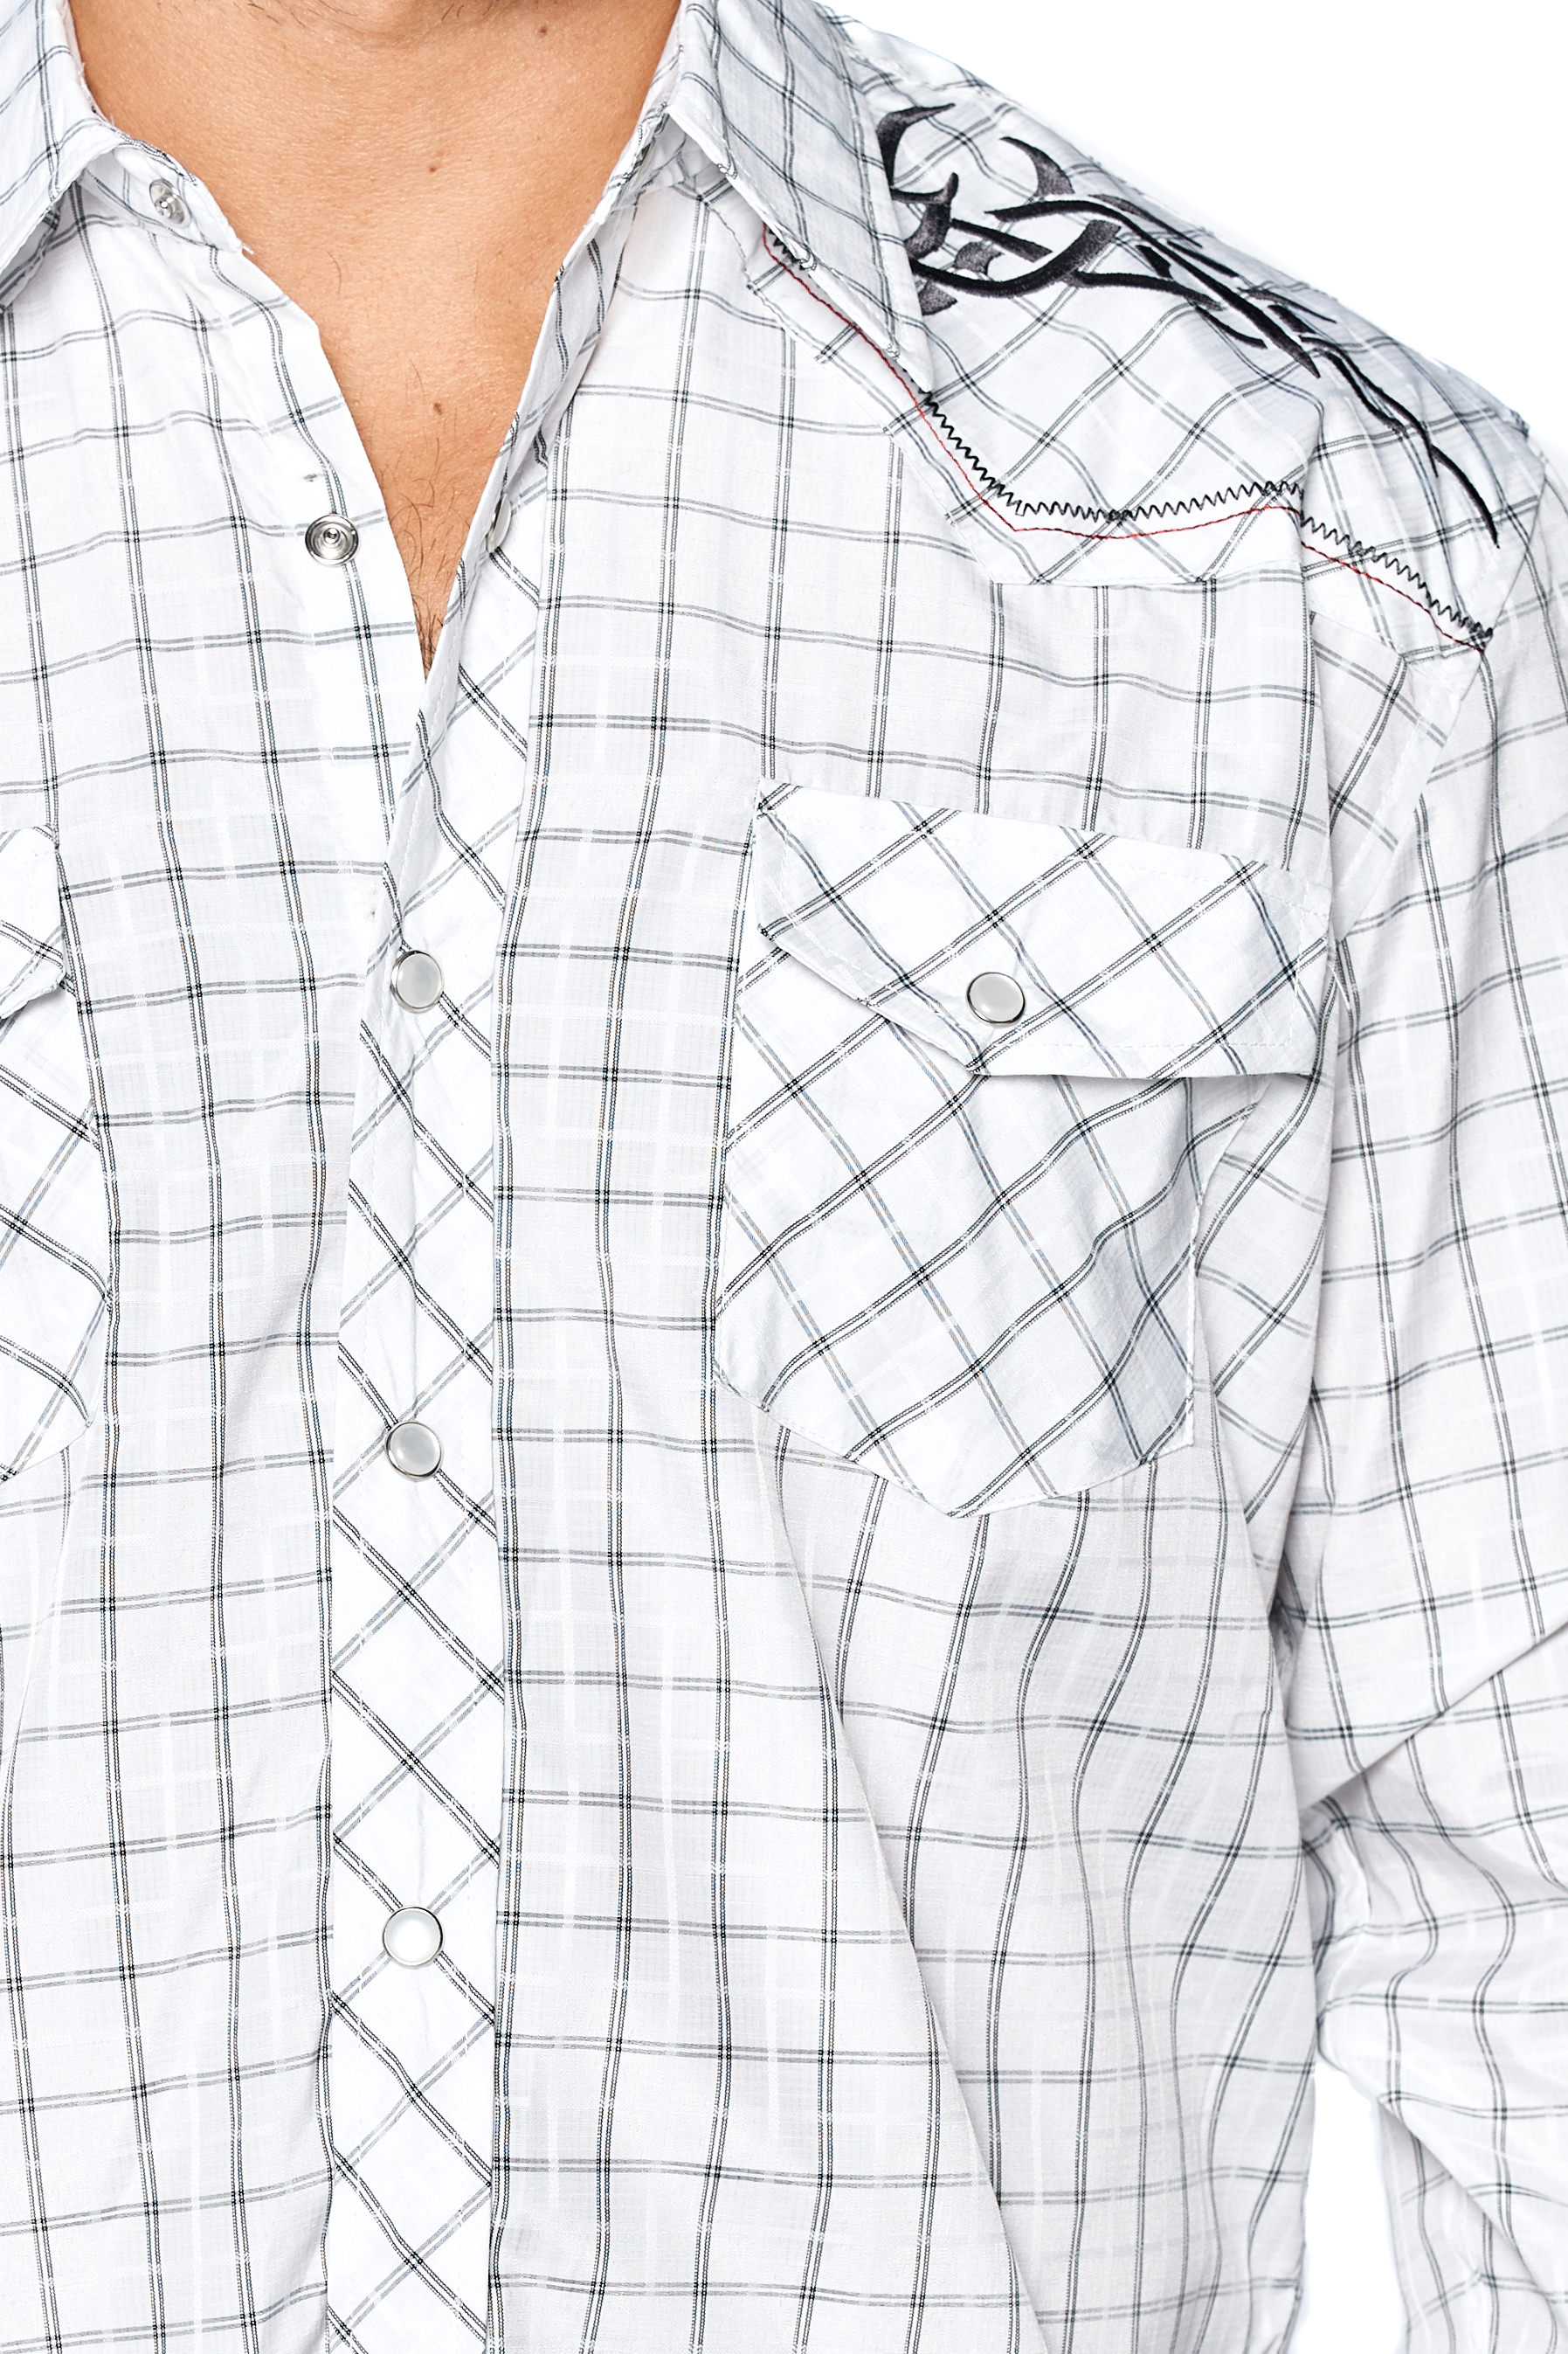 LW-Men-039-s-Pearl-Snap-Tribal-Stylish-Printed-Woven-Western-Vaquero-Rodeo-Shirt thumbnail 64